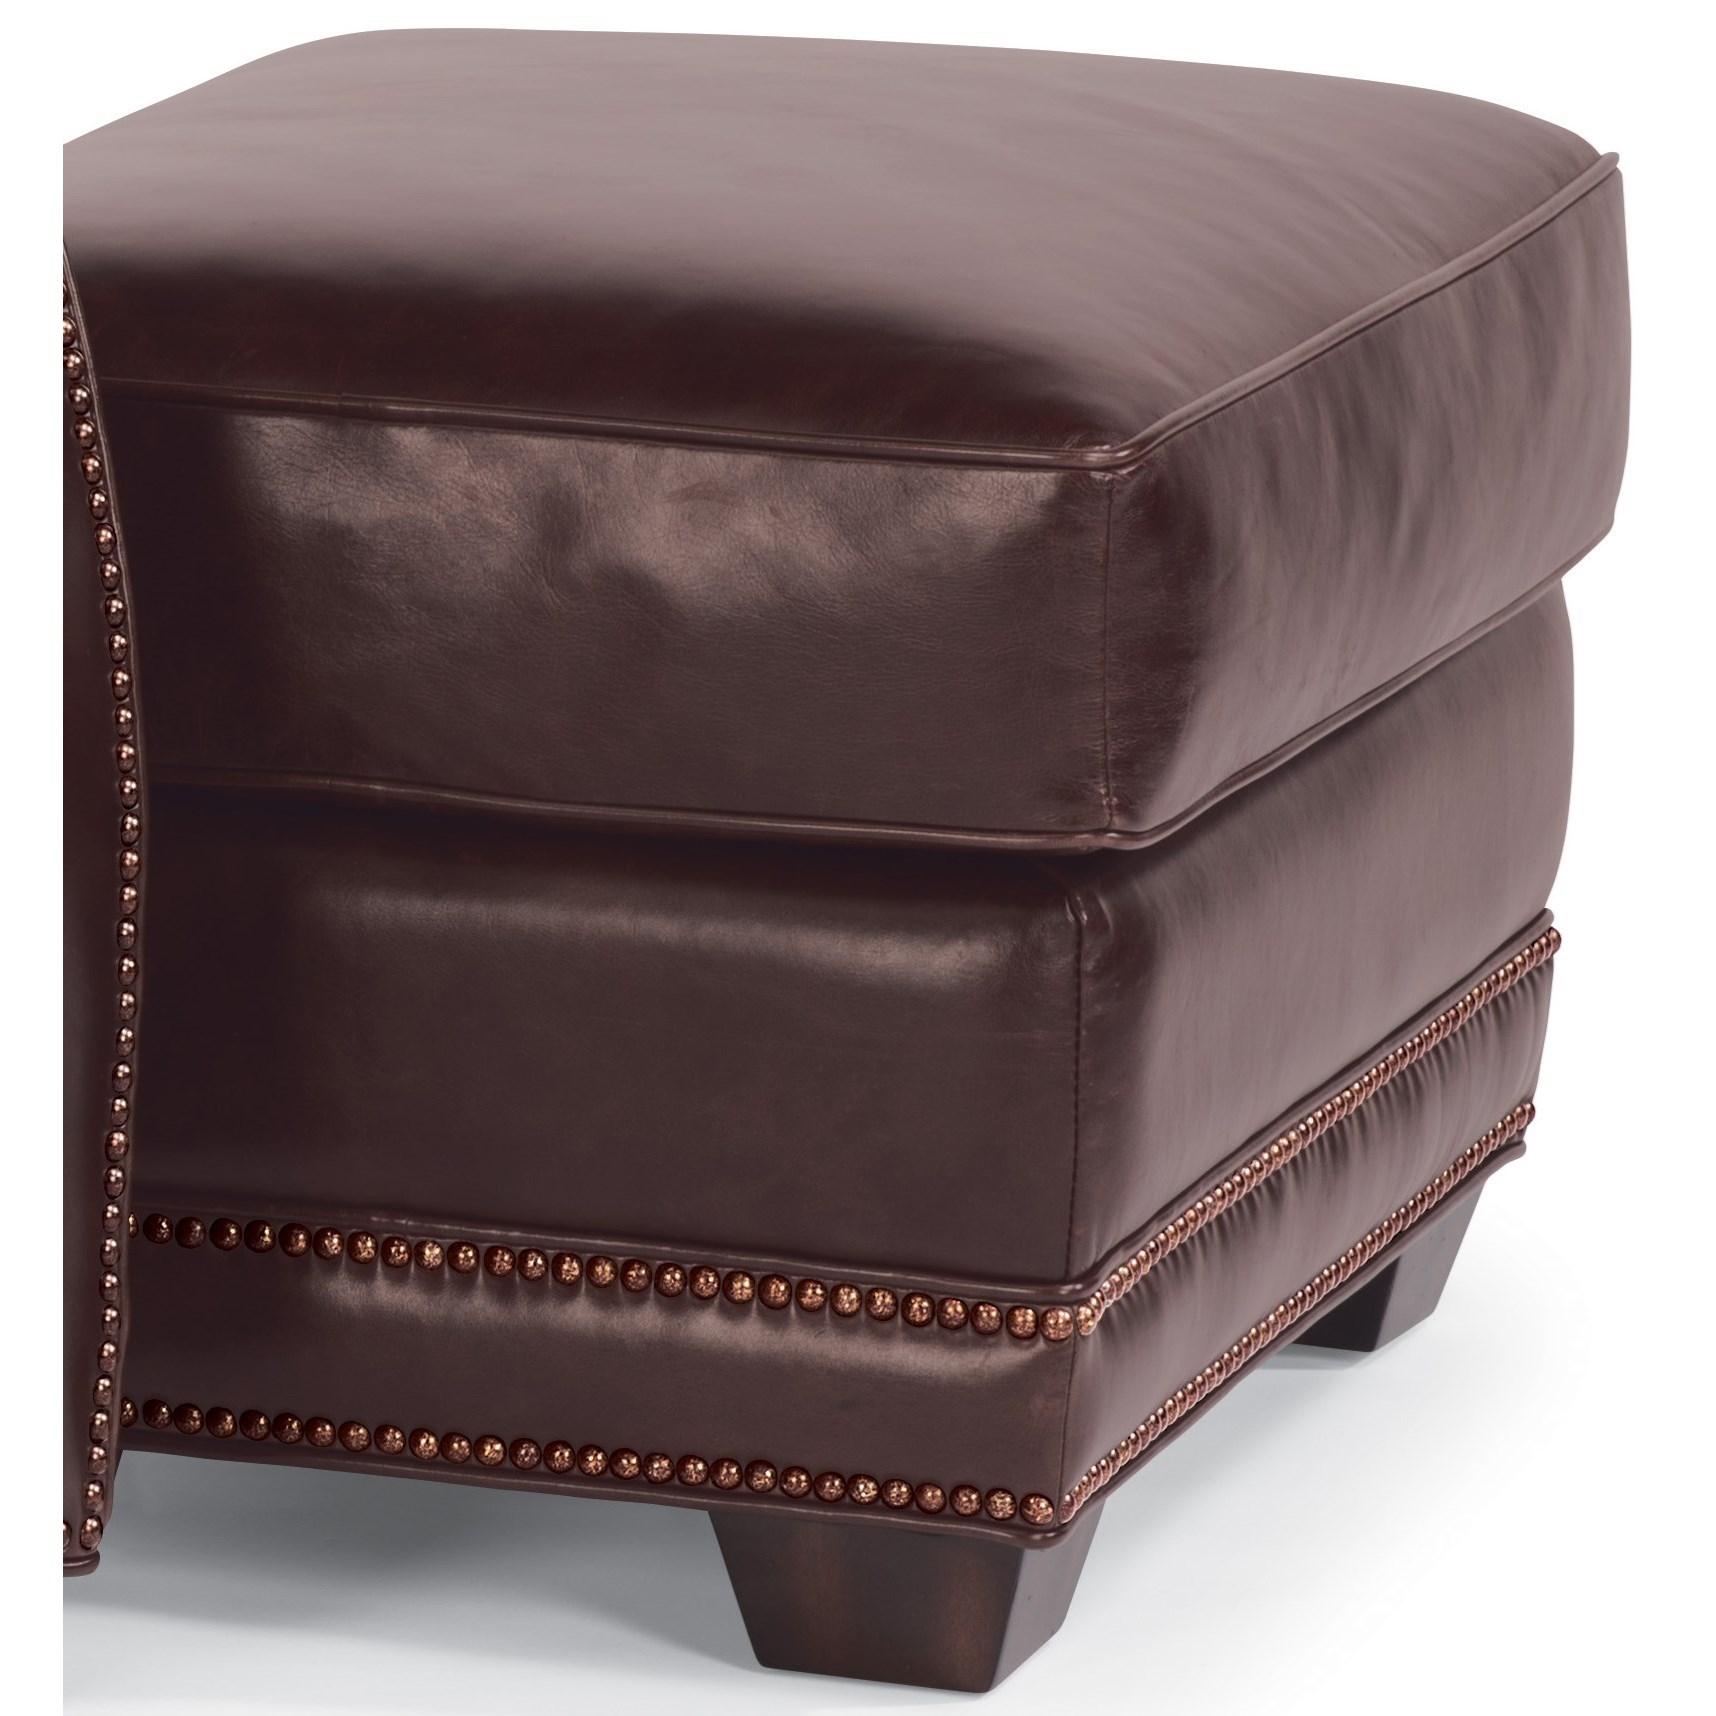 Flexsteel Latitudes-Raleigh Leather Ottoman  - Item Number: 1260-08